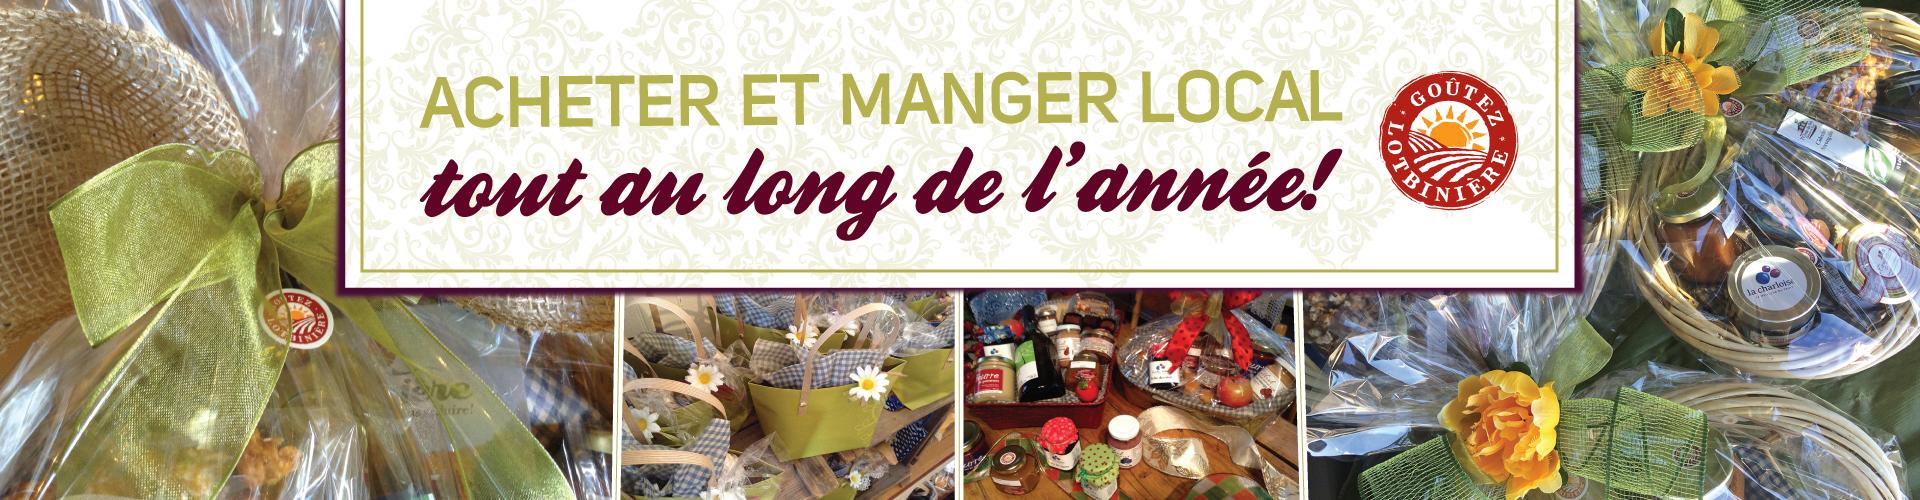 Slider_Paniers-cadeaux_Annee